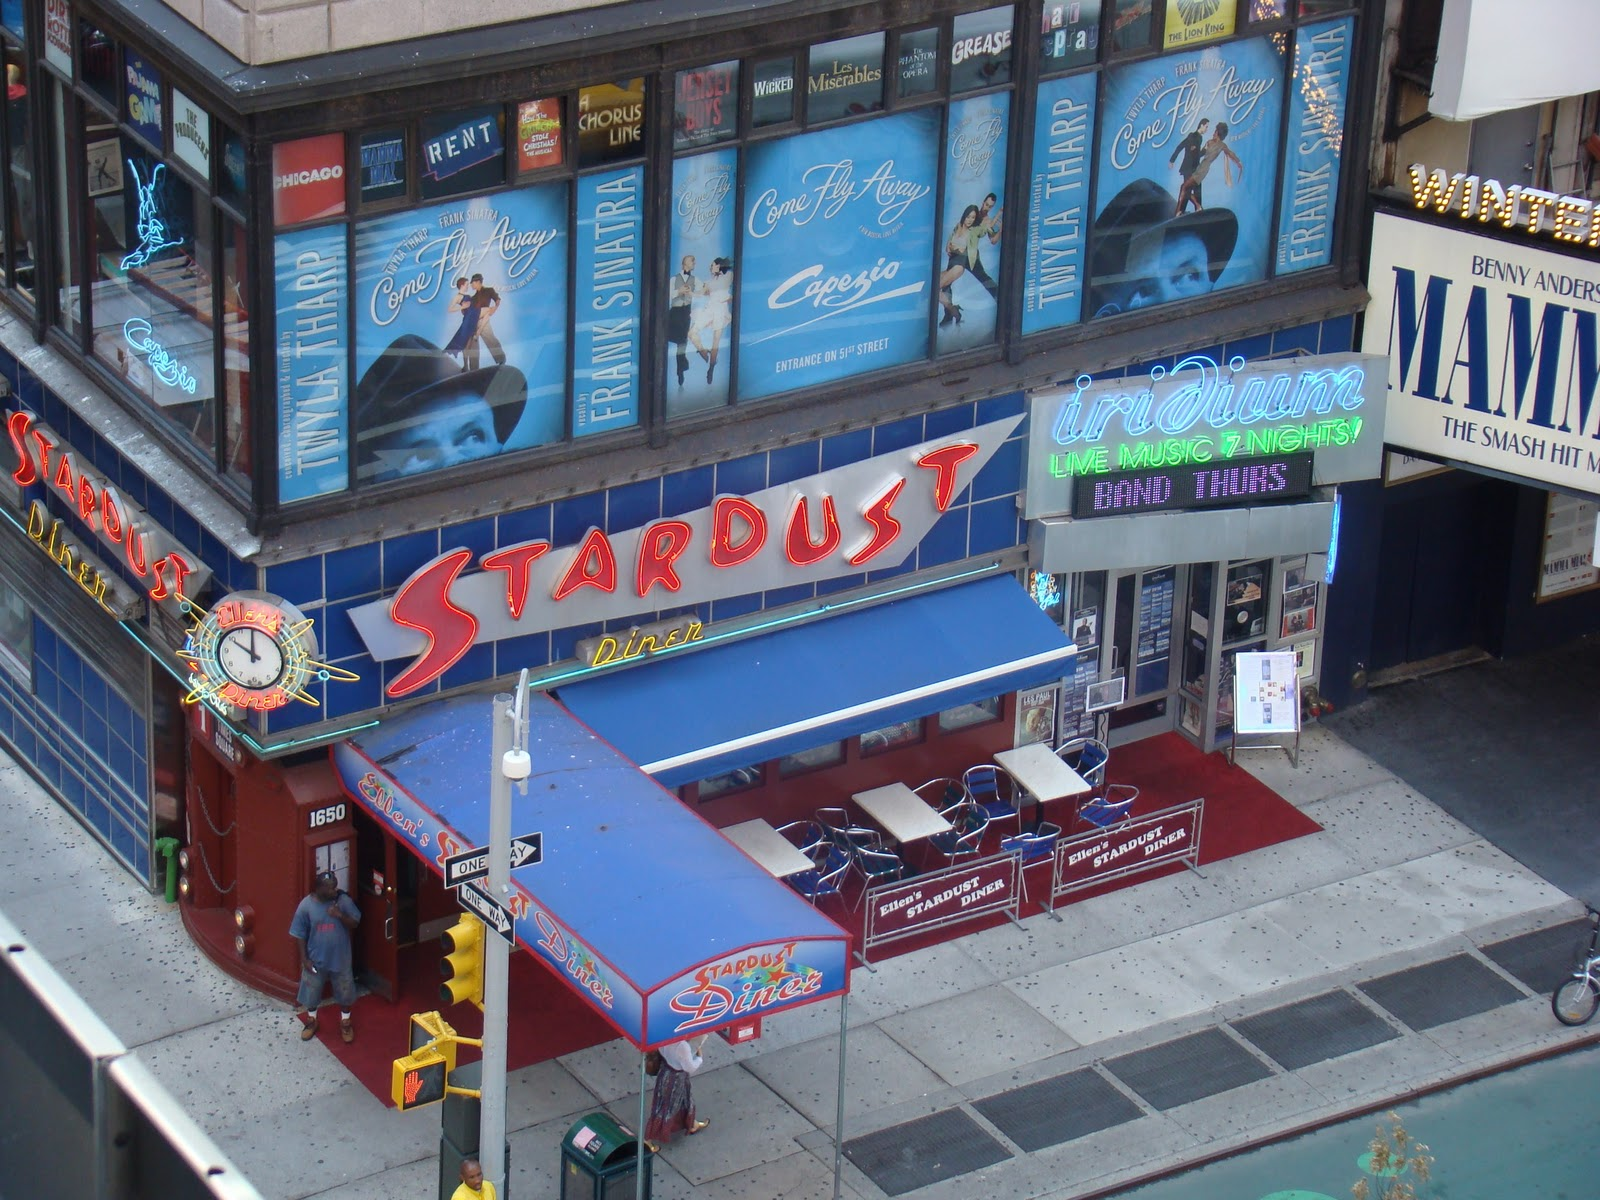 Ellen's Stardust Dinner, NYC